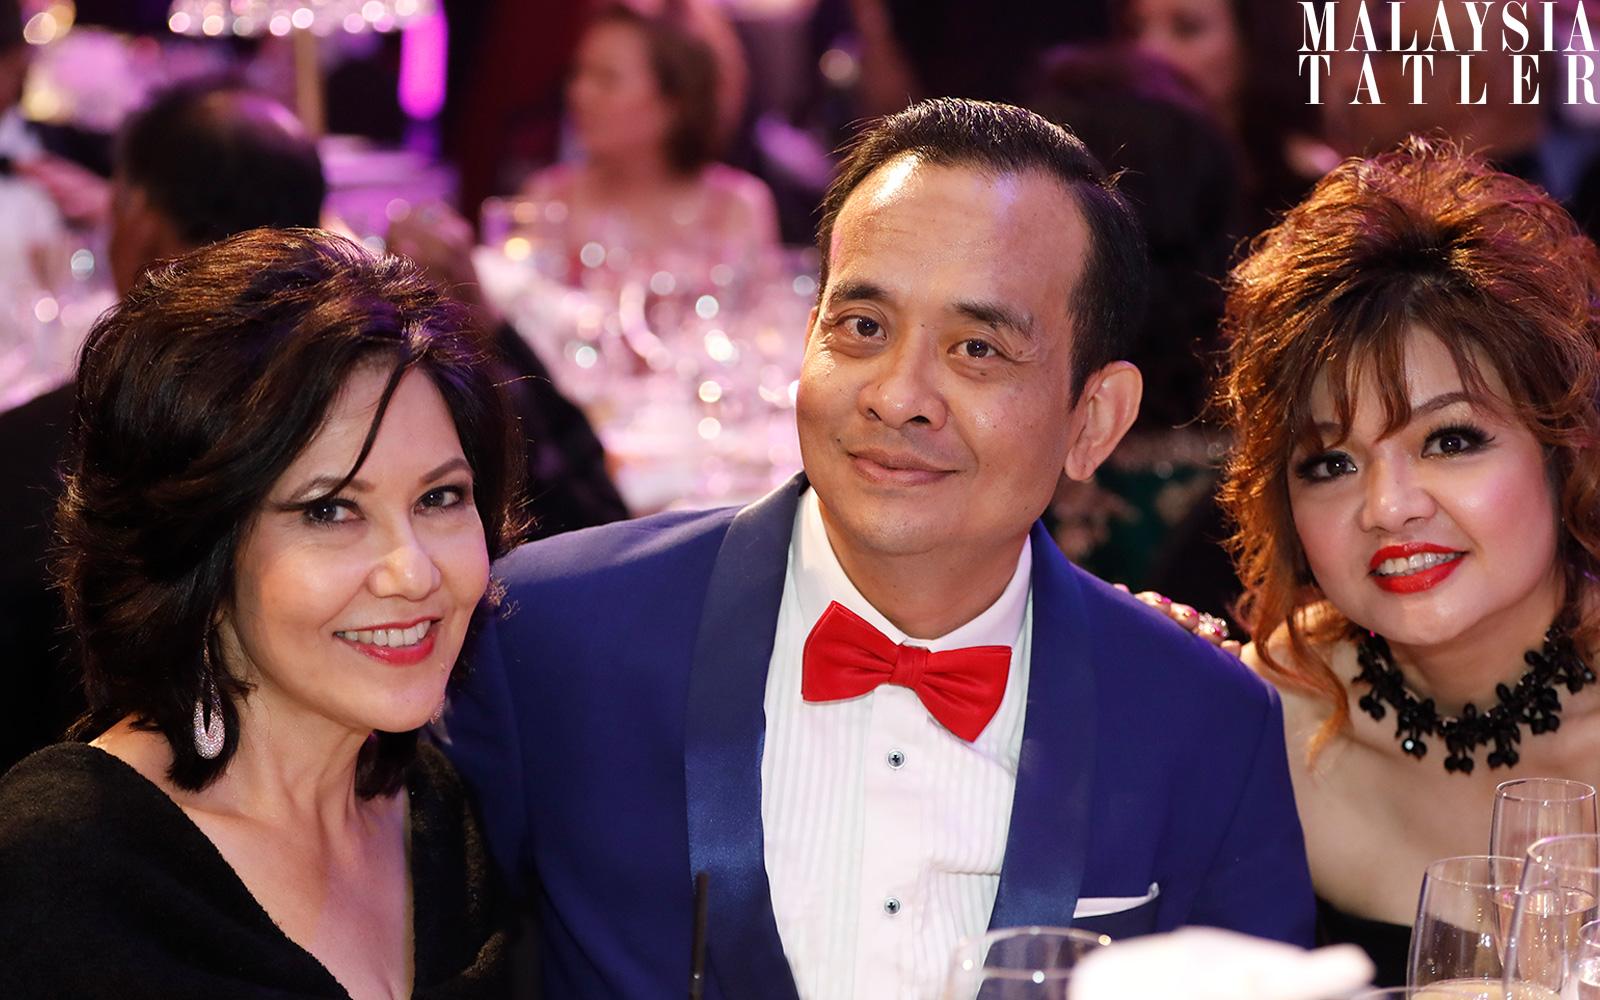 Alice Yong, Jamaludin Zakaria and Lily Tan